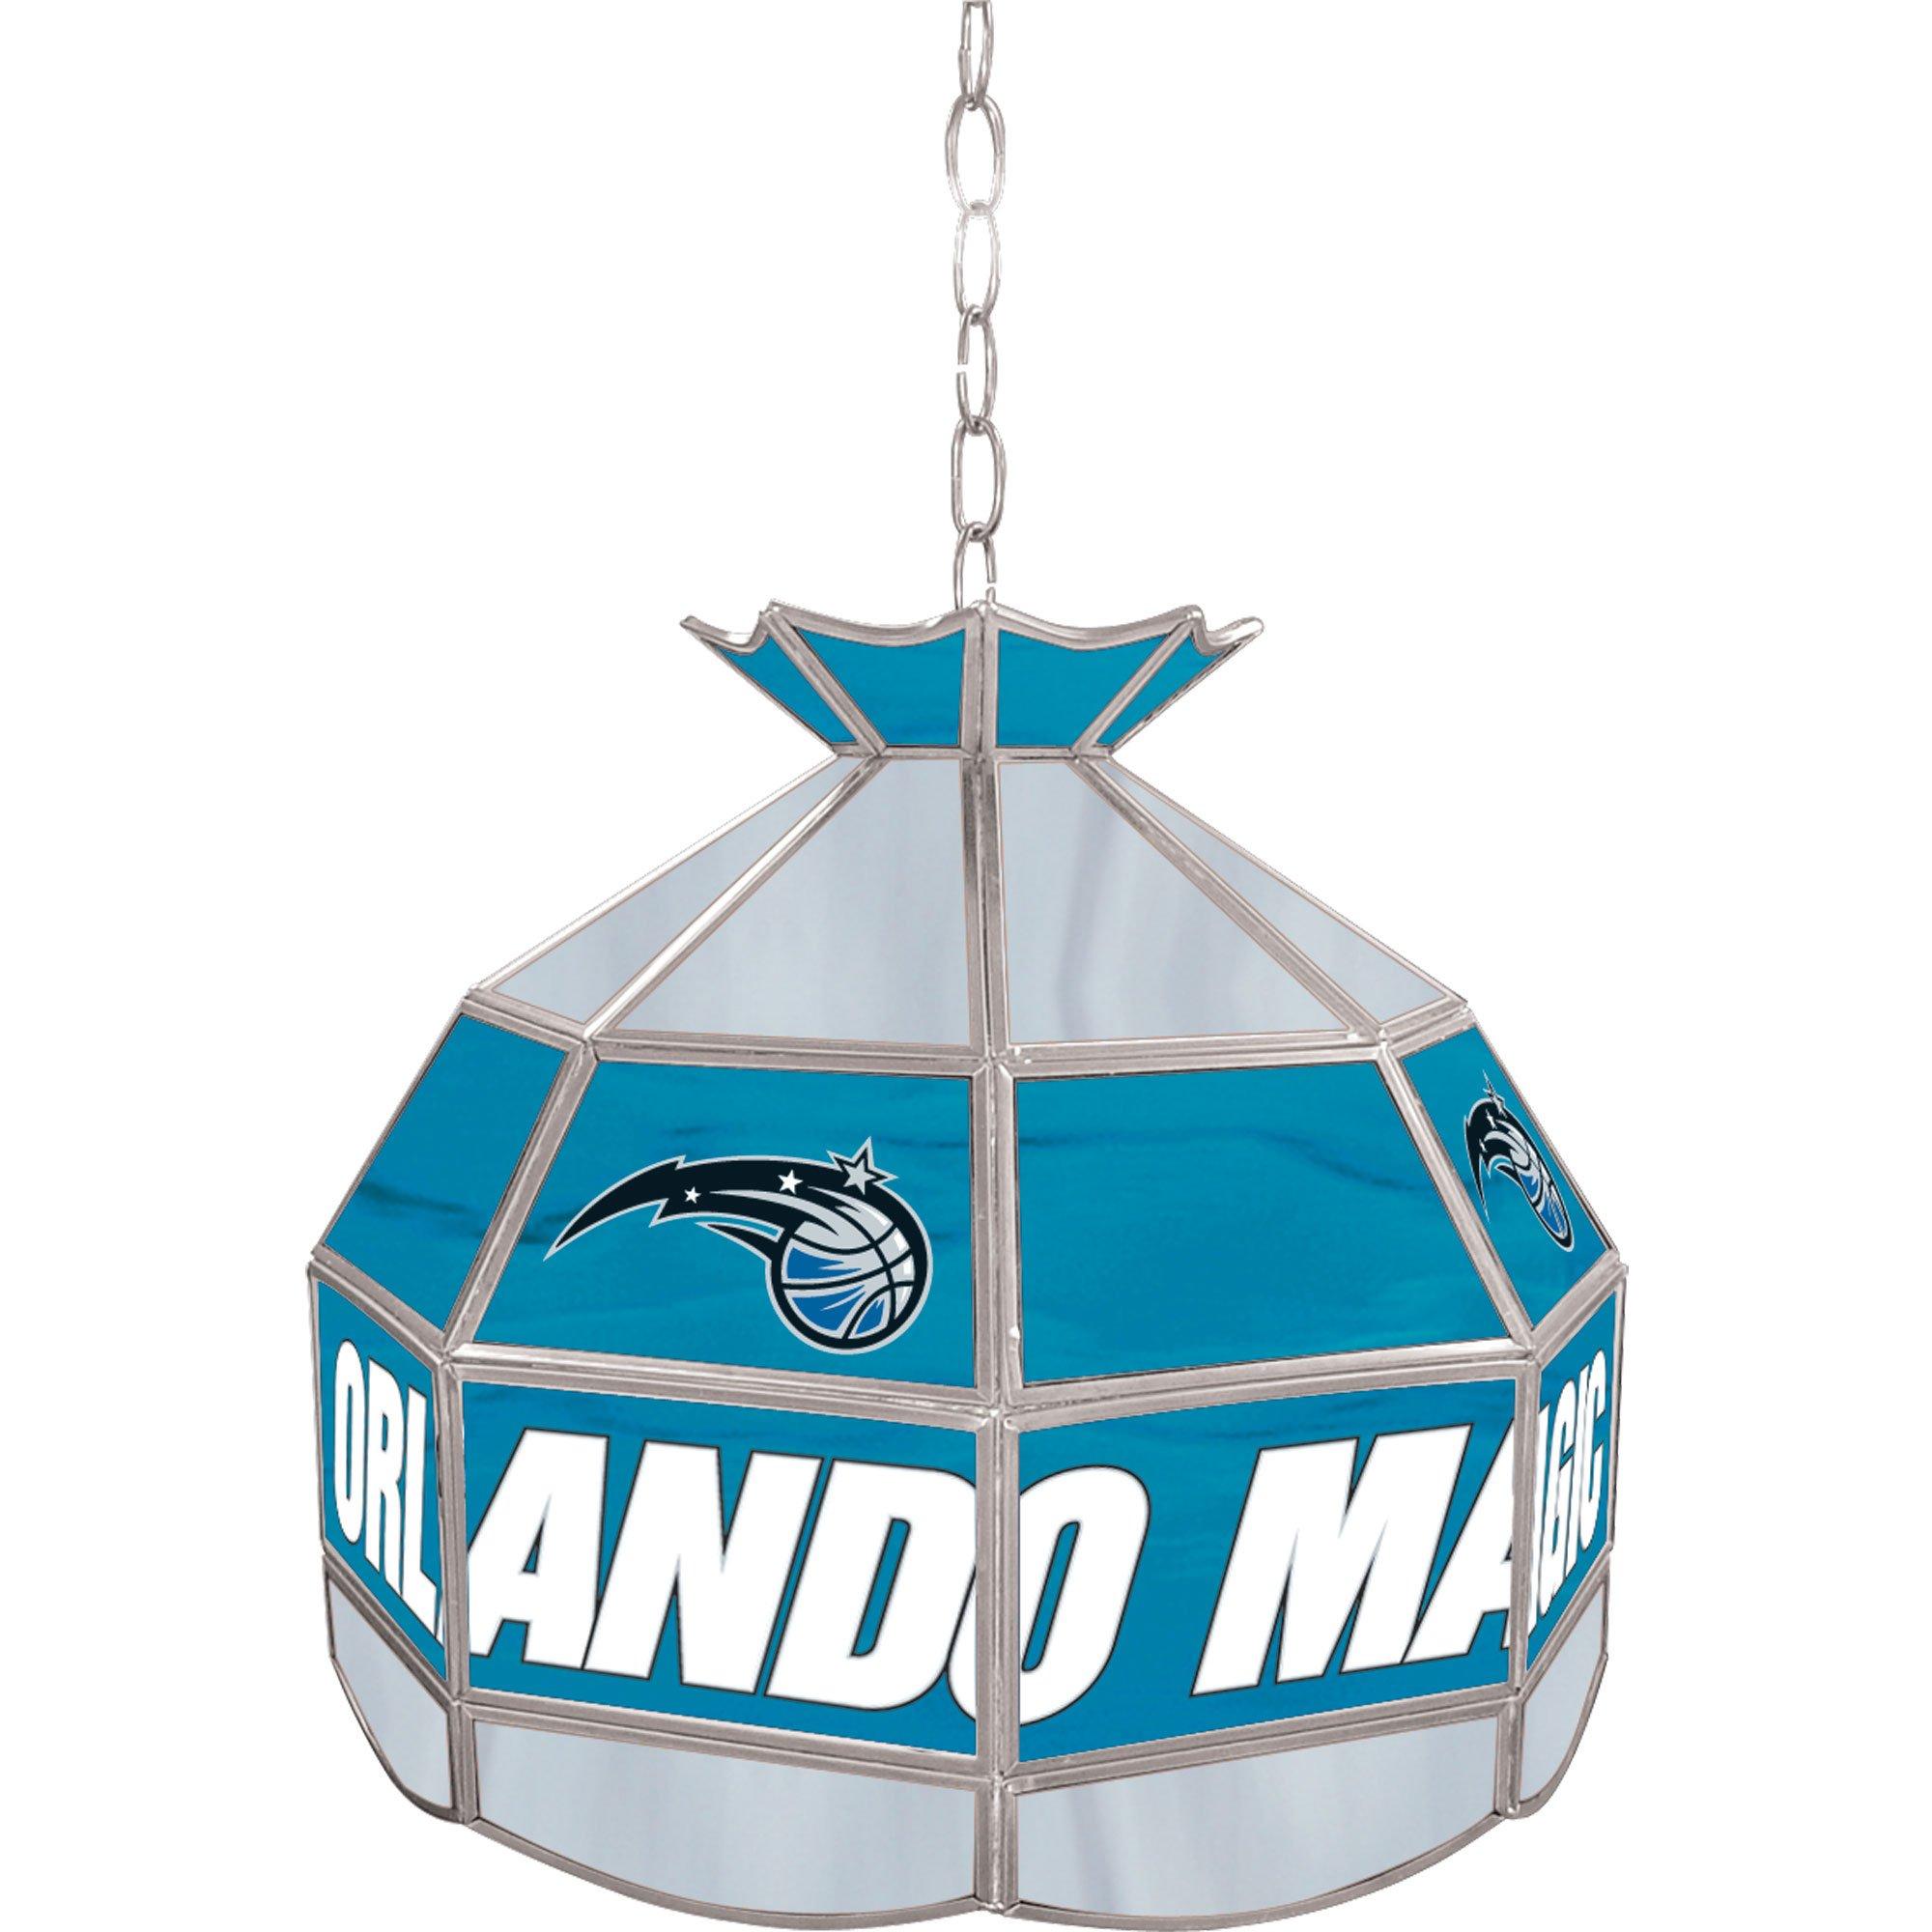 NBA Orlando Magic Tiffany Gameroom Lamp, 16''